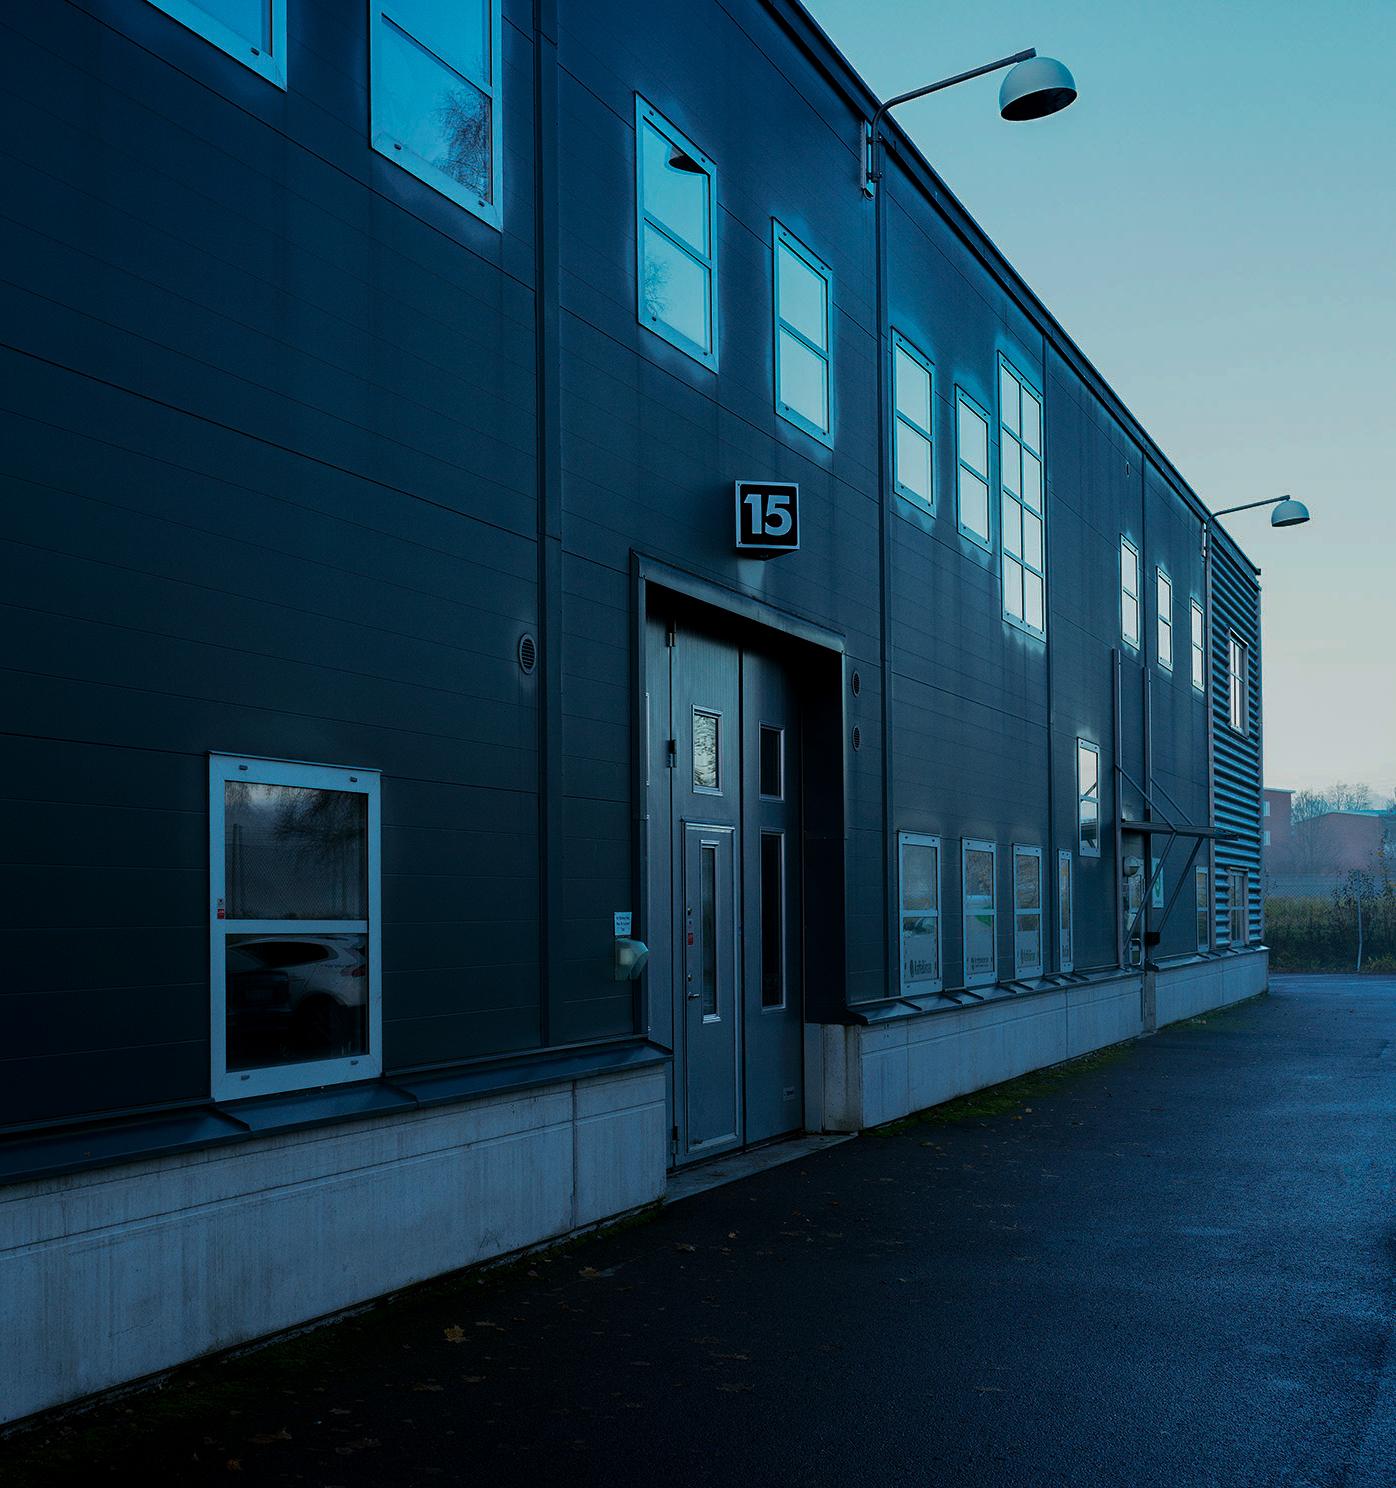 Mondo arkitekter Kroken fasad